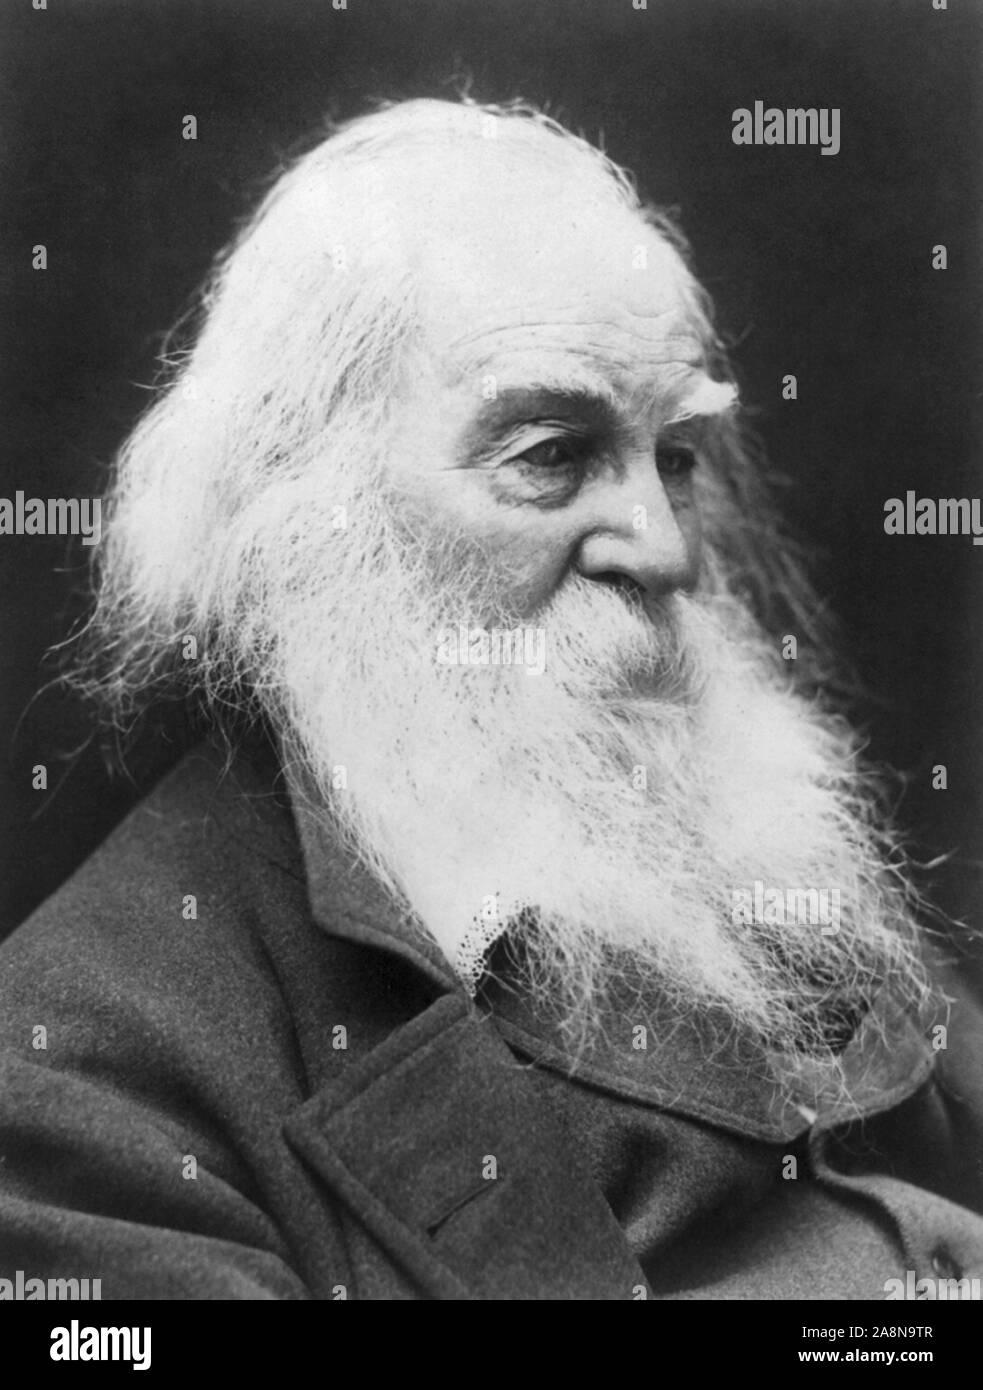 Vintage portrait photo of American poet, essayist and journalist Walt Whitman (1819 – 1892). Photo circa 1887 by G C Cox. Stock Photo